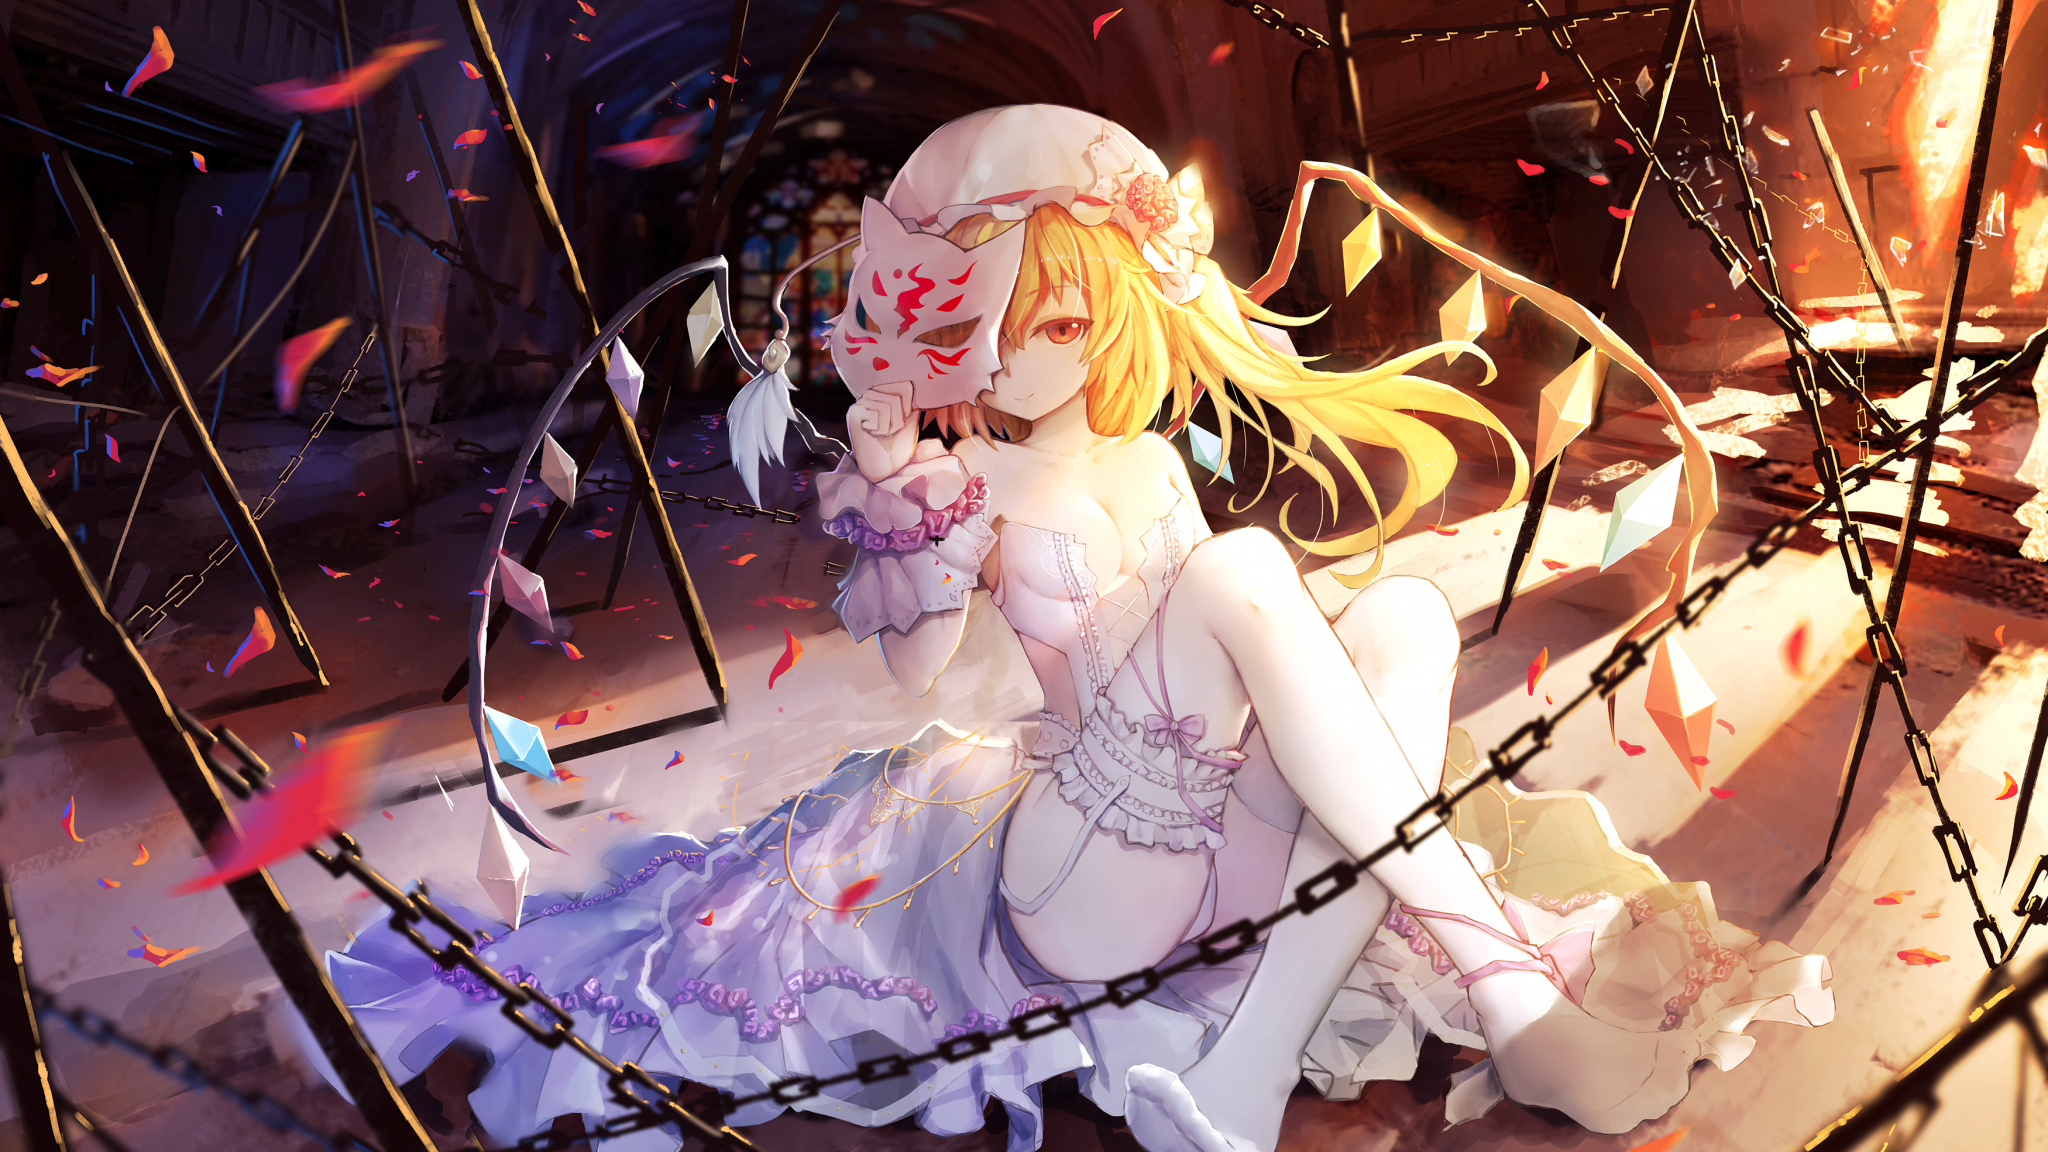 Download 2048x1152 Wallpaper Flandre Scarlet Touhou Anime